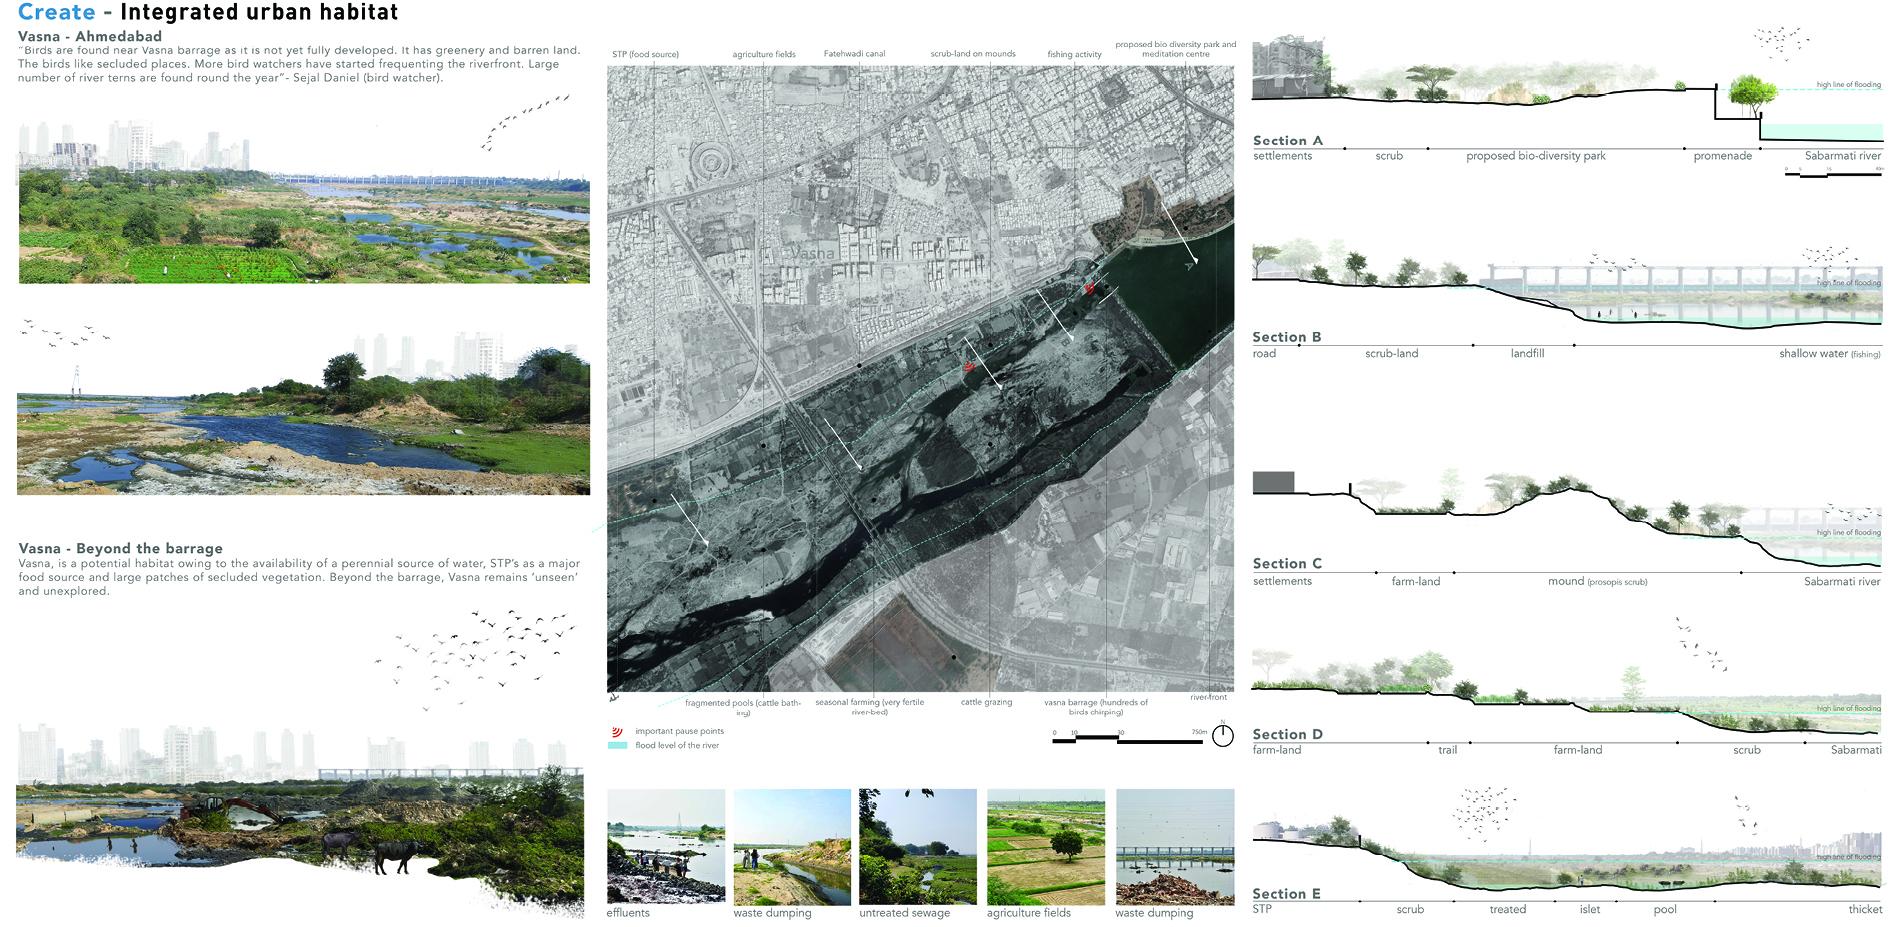 Create - Integrated urban habitats